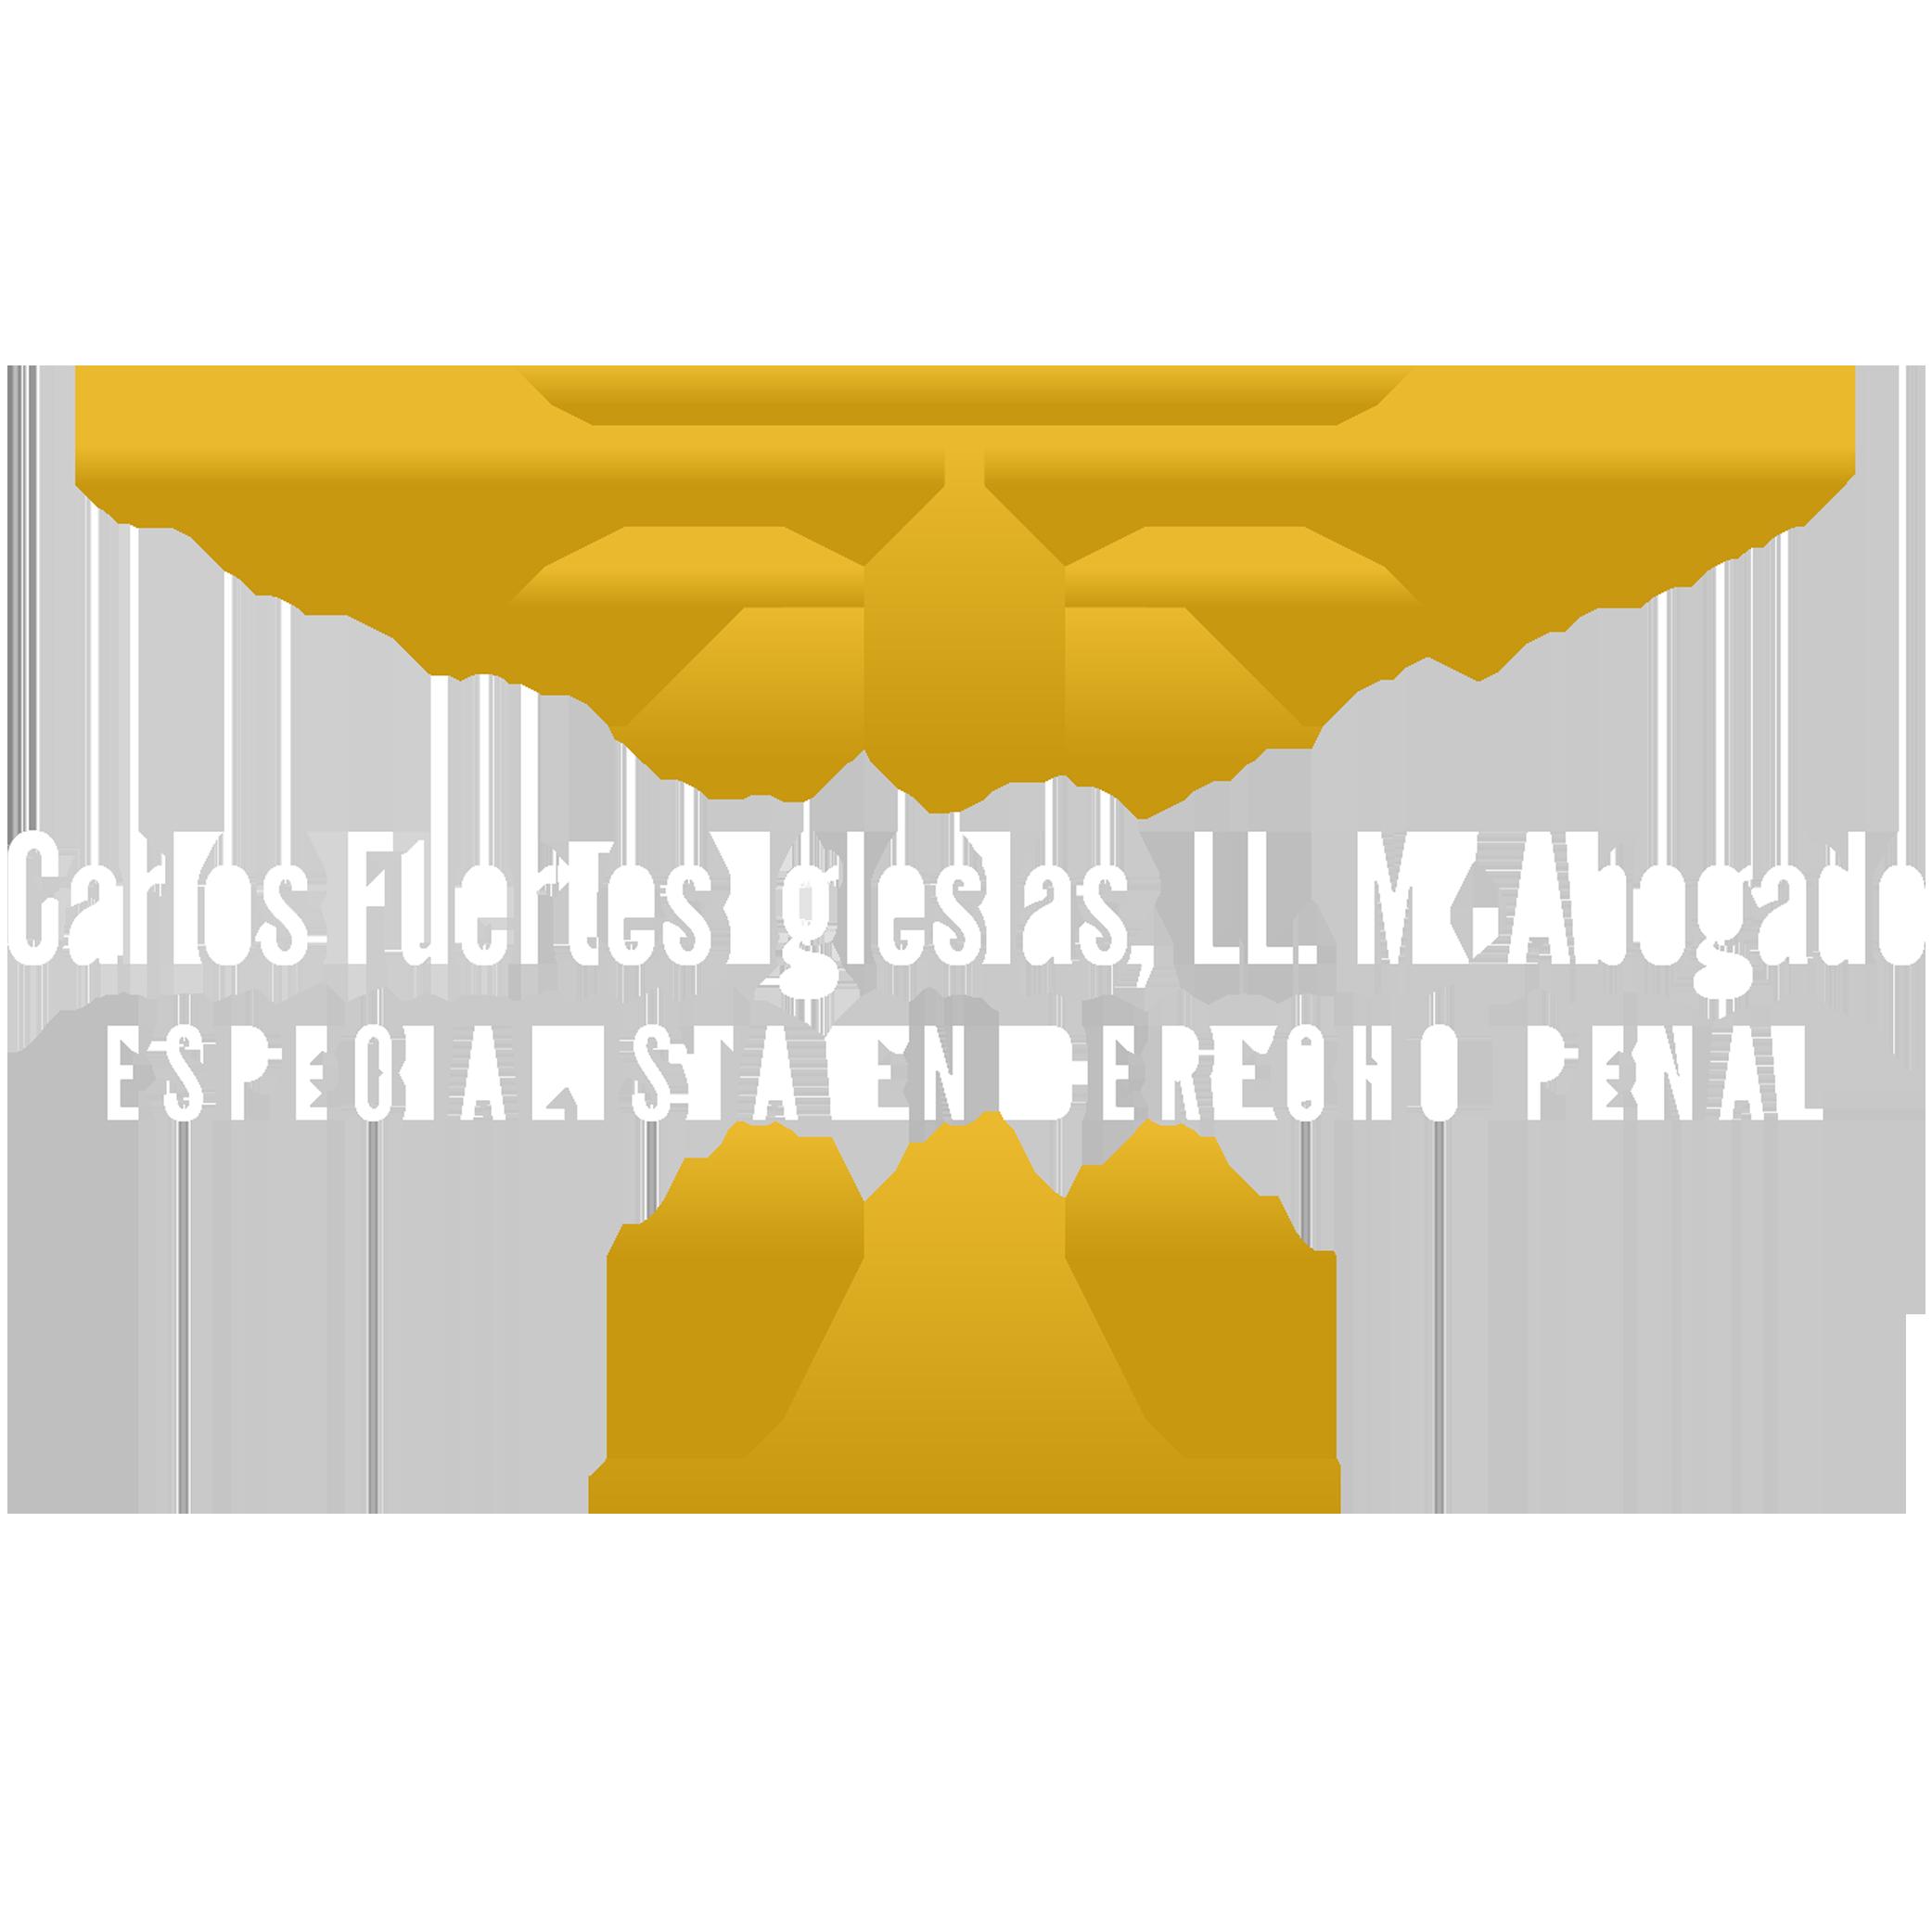 Carlos Fuertes Iglesias